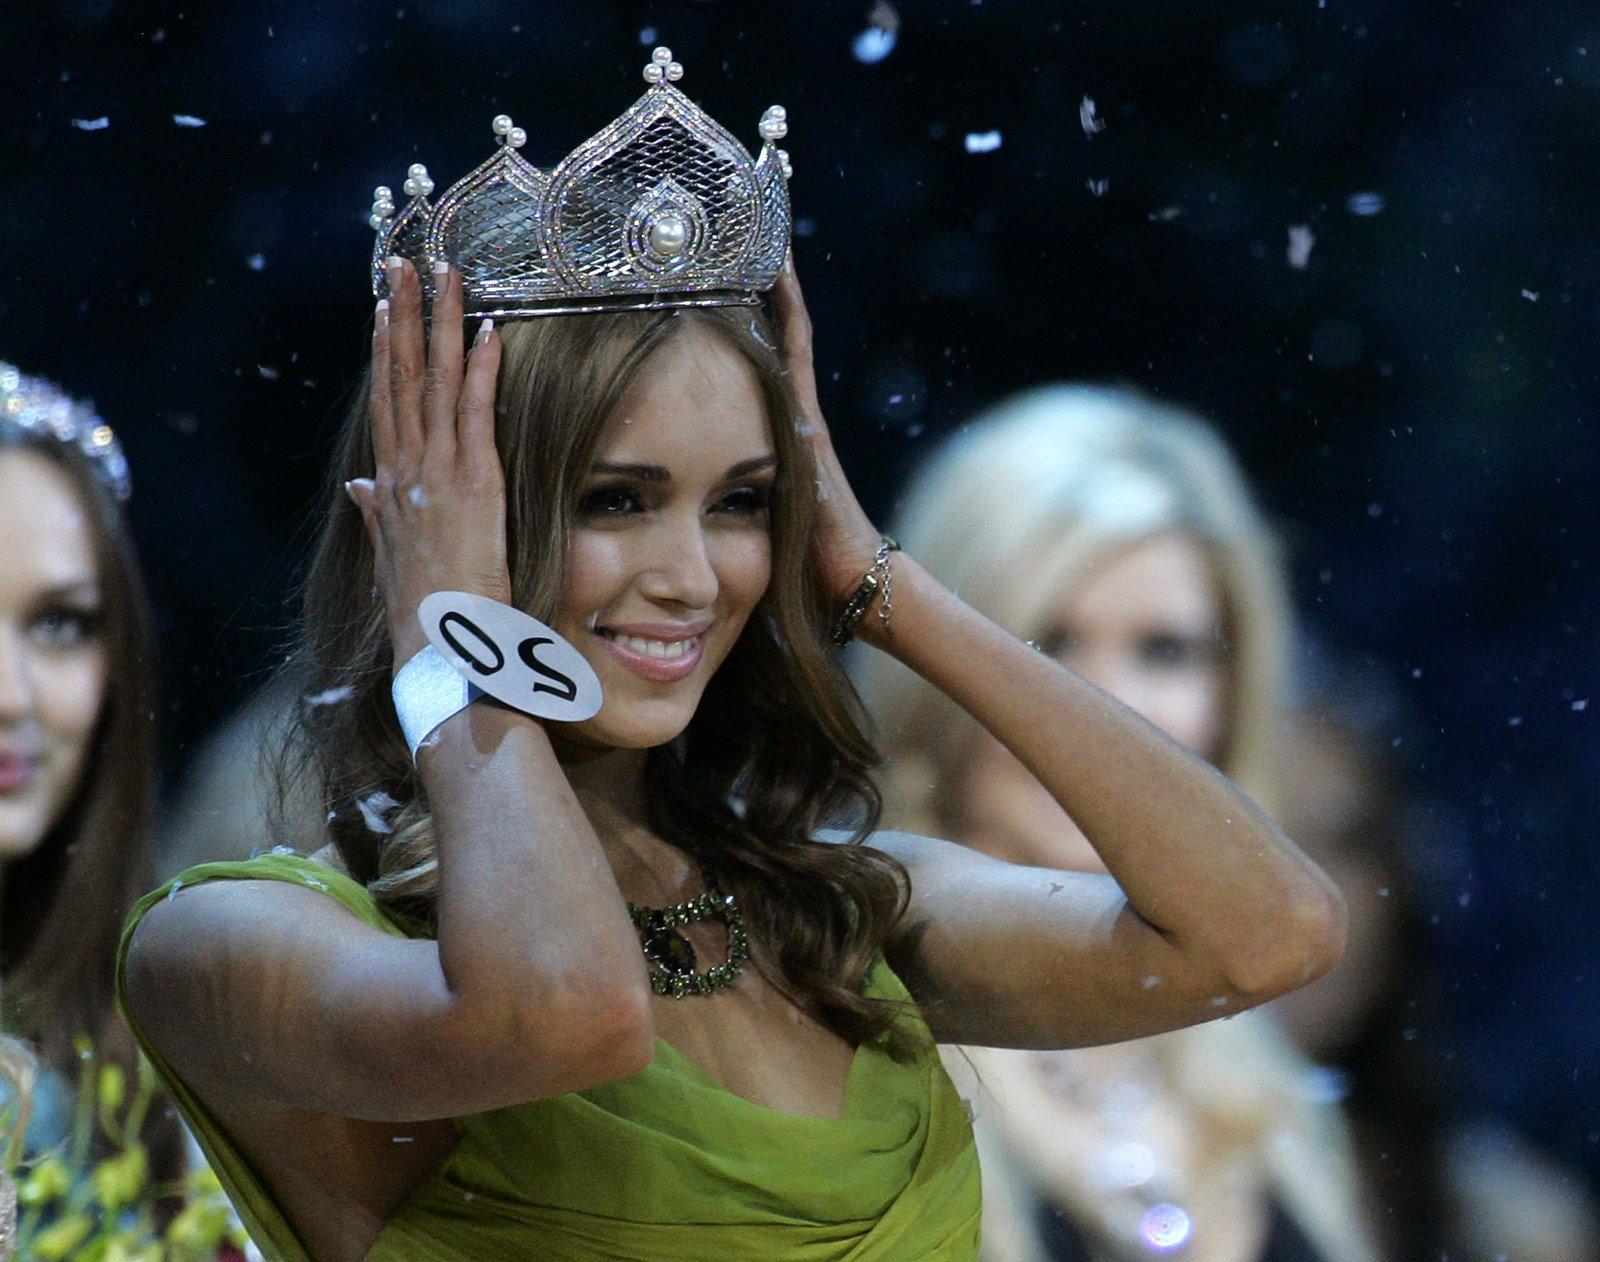 http://1.bp.blogspot.com/_qH1nDo_zS60/ST0ofnAH3NI/AAAAAAAABDs/aHVQVuQu5qw/s1600/Ksenia_Sukhinova_02.jpg